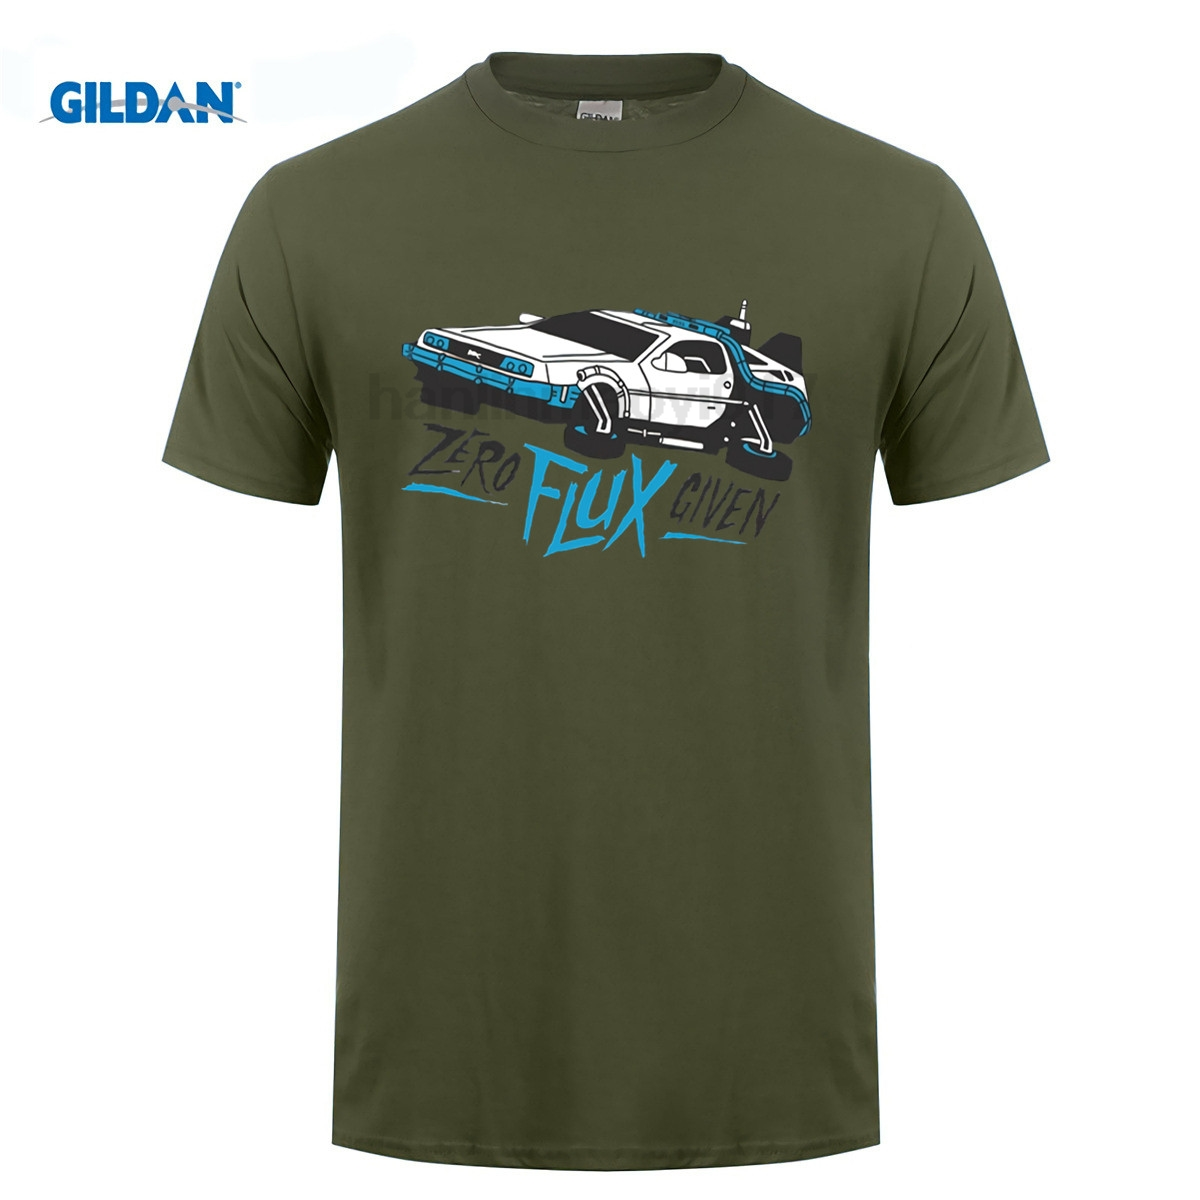 GILDAN Back to the Future Classic Movie Series T-shirt Men Hip Hop Short Sleeve TShirts Summer T Shirts